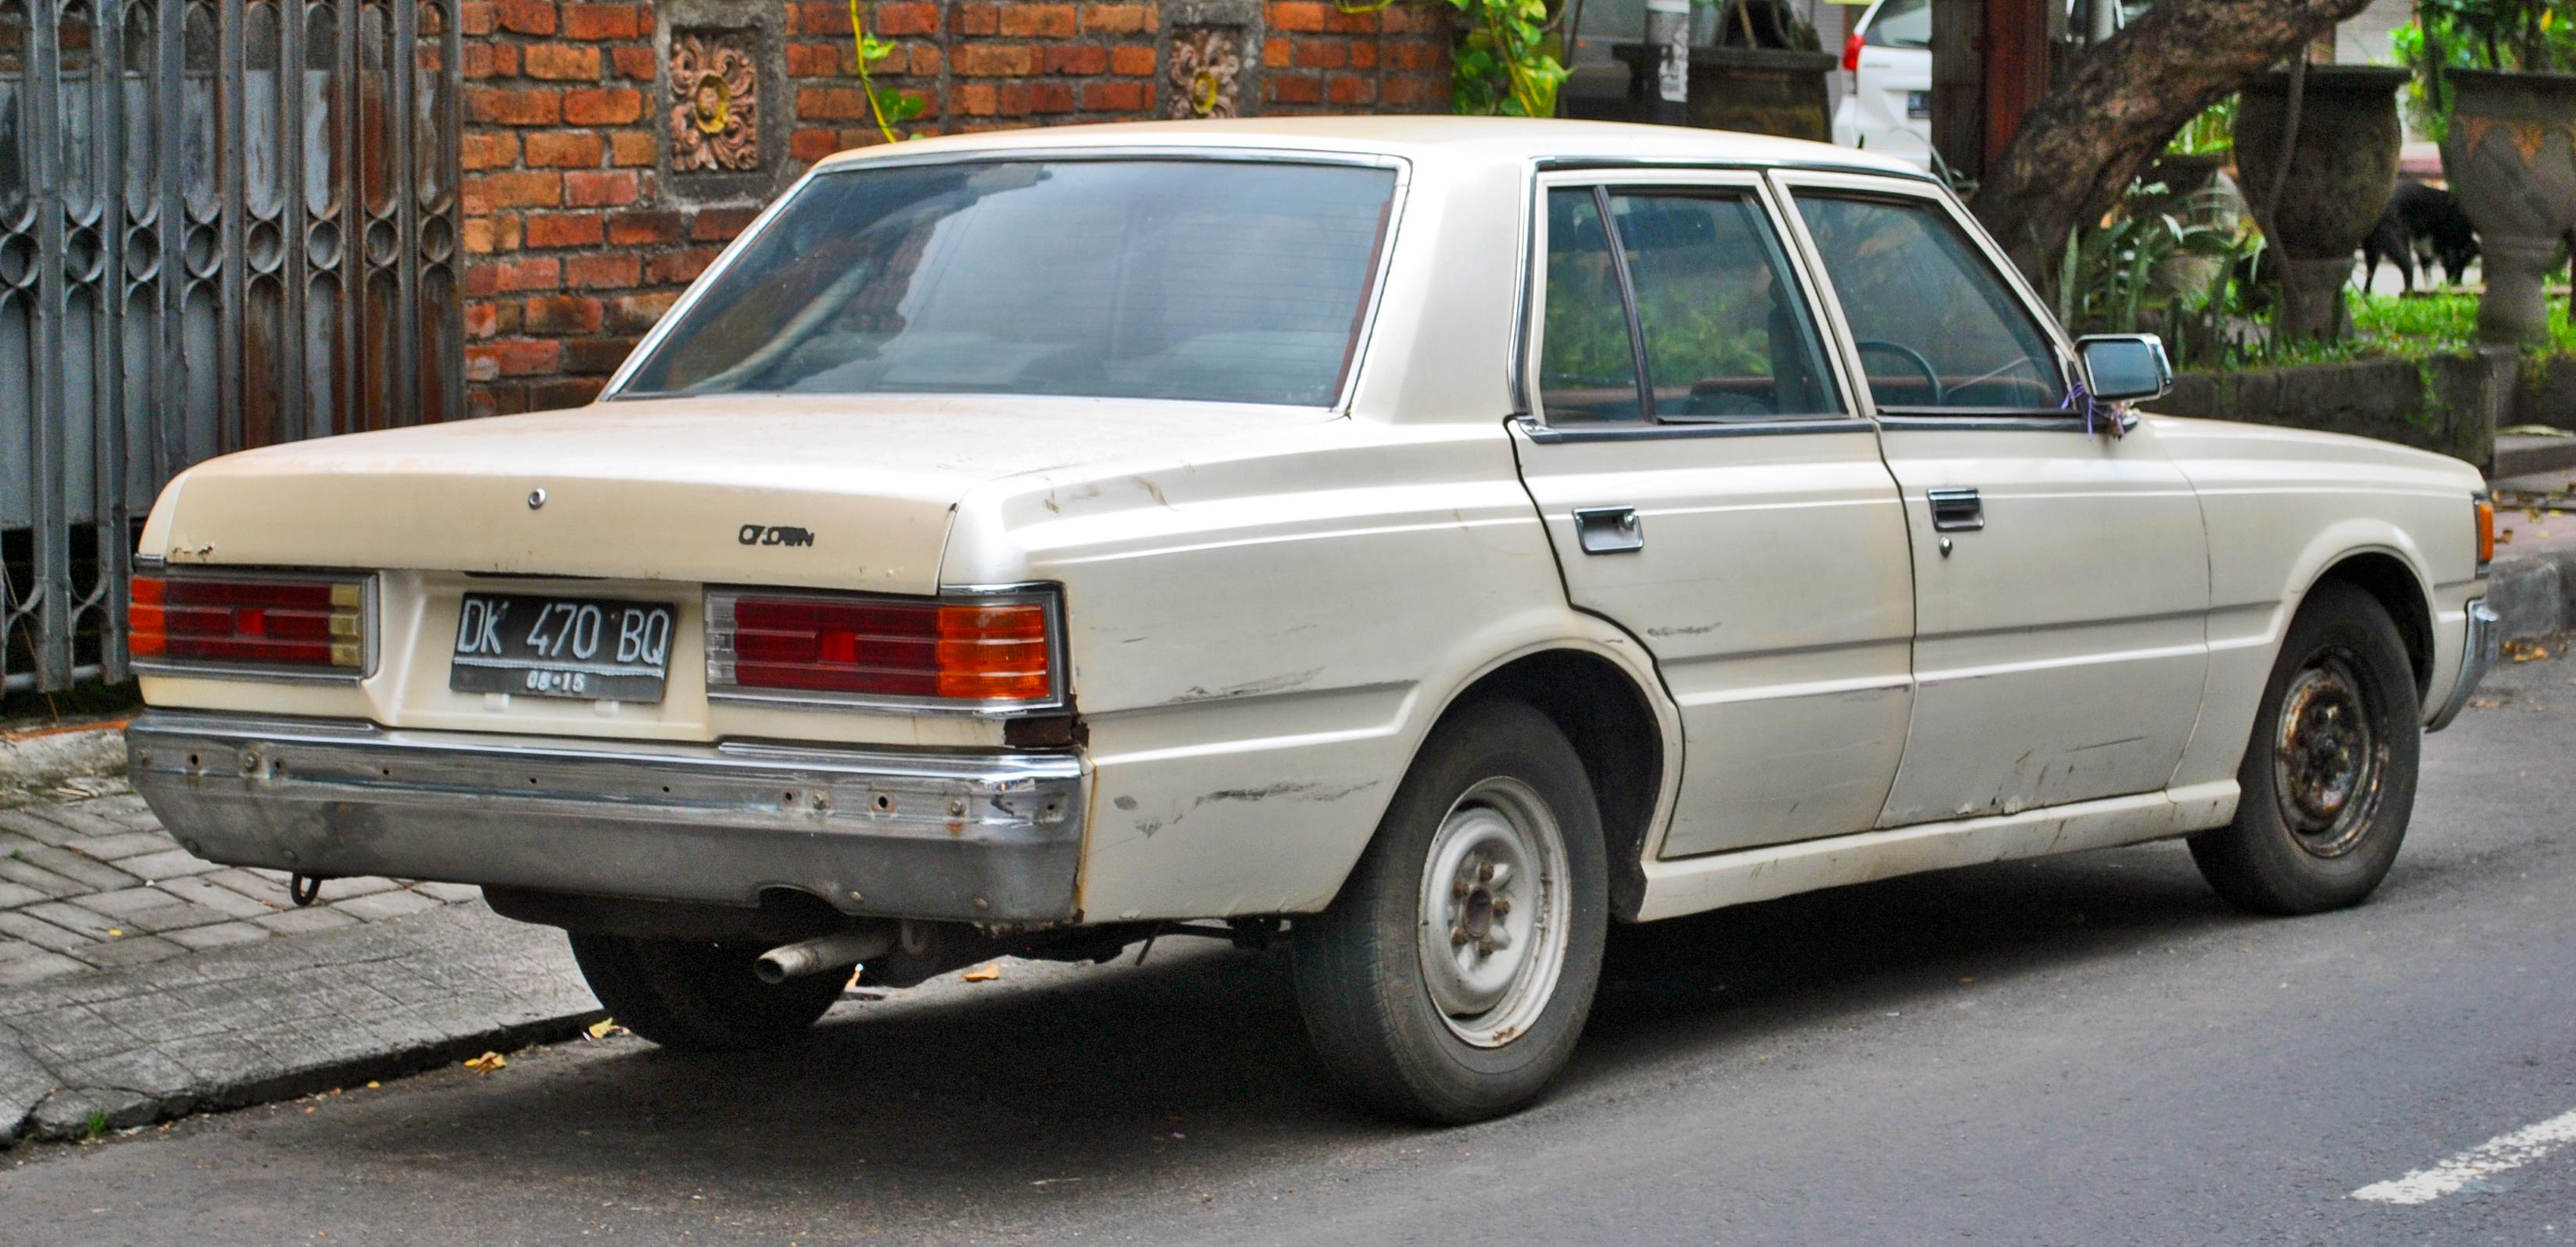 File:Toyota Crown (S110) (rear), Denpasar.jpg - Wikimedia ...